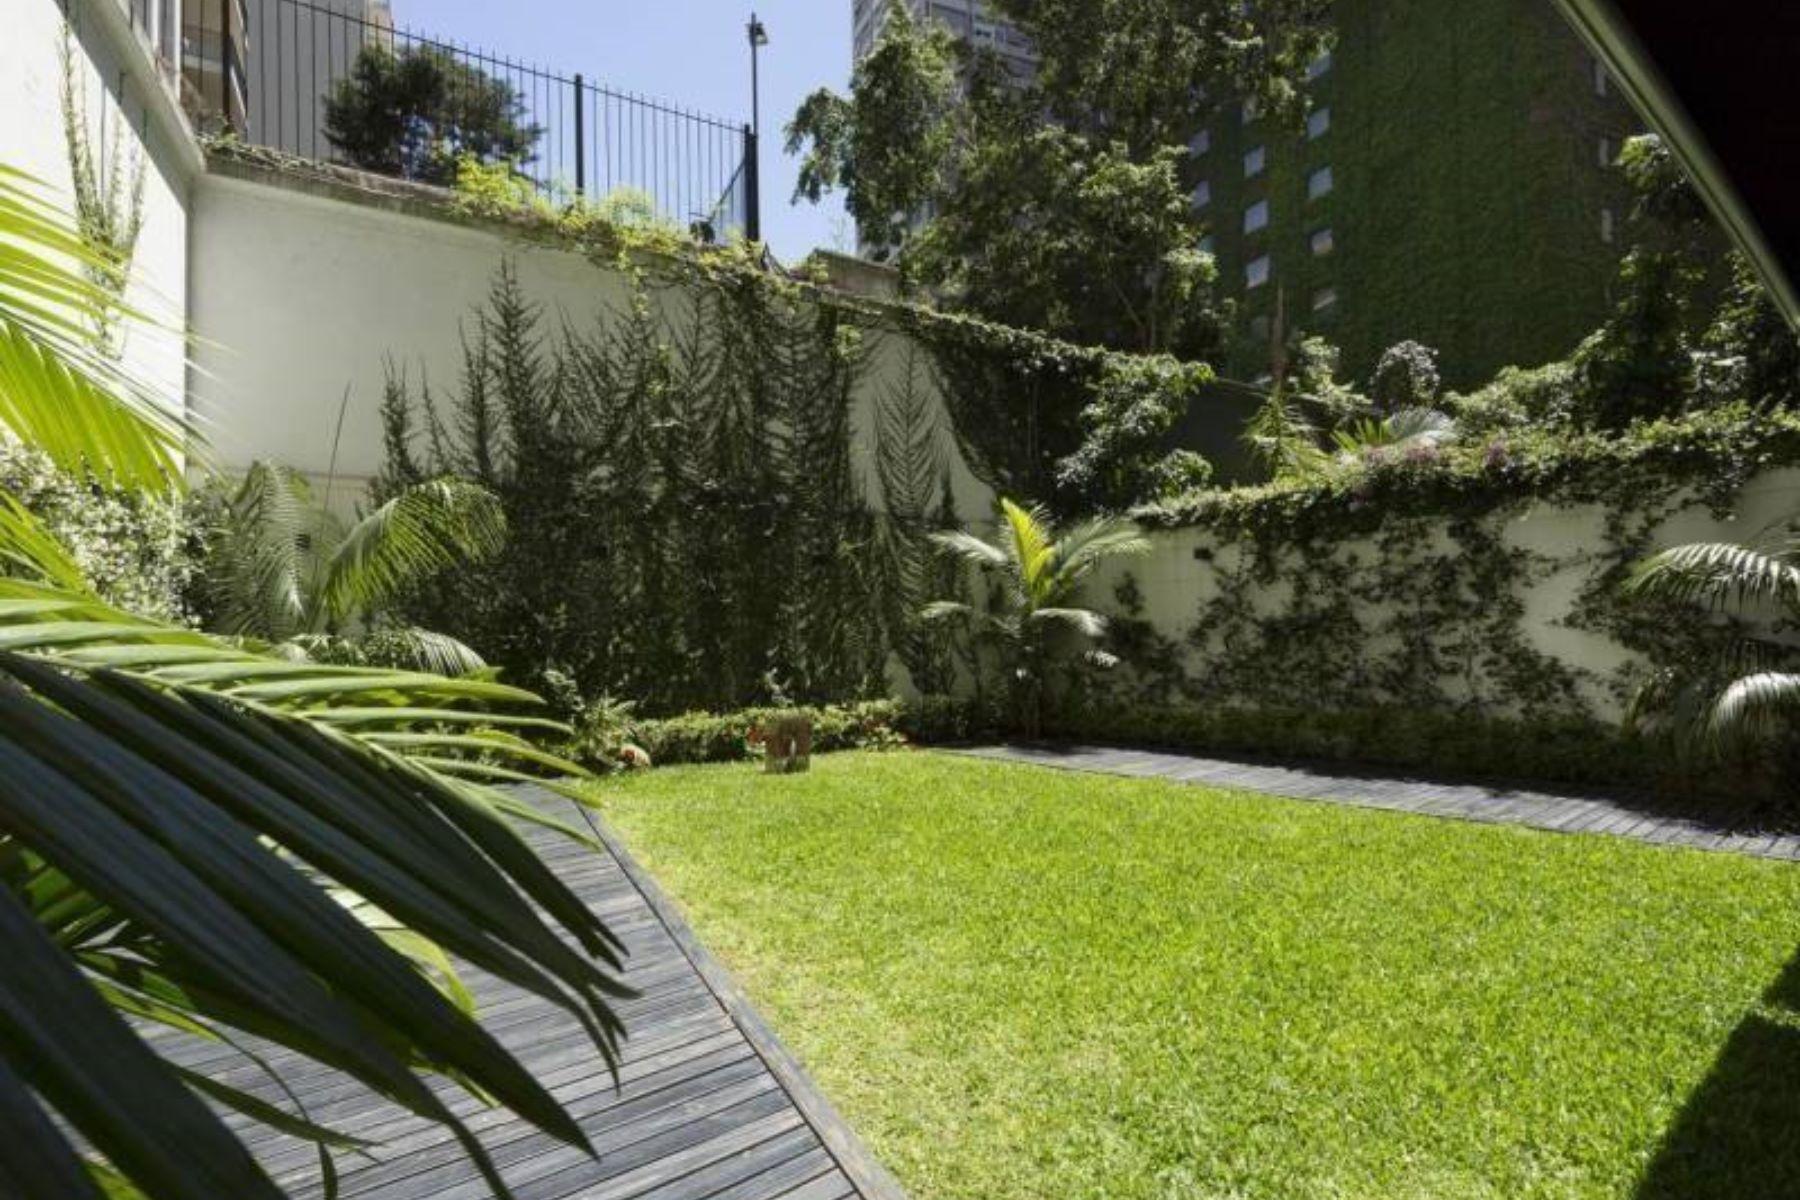 Single Family Homes for Sale at Ciudad De Buenos Aires, Buenos Aires Argentina